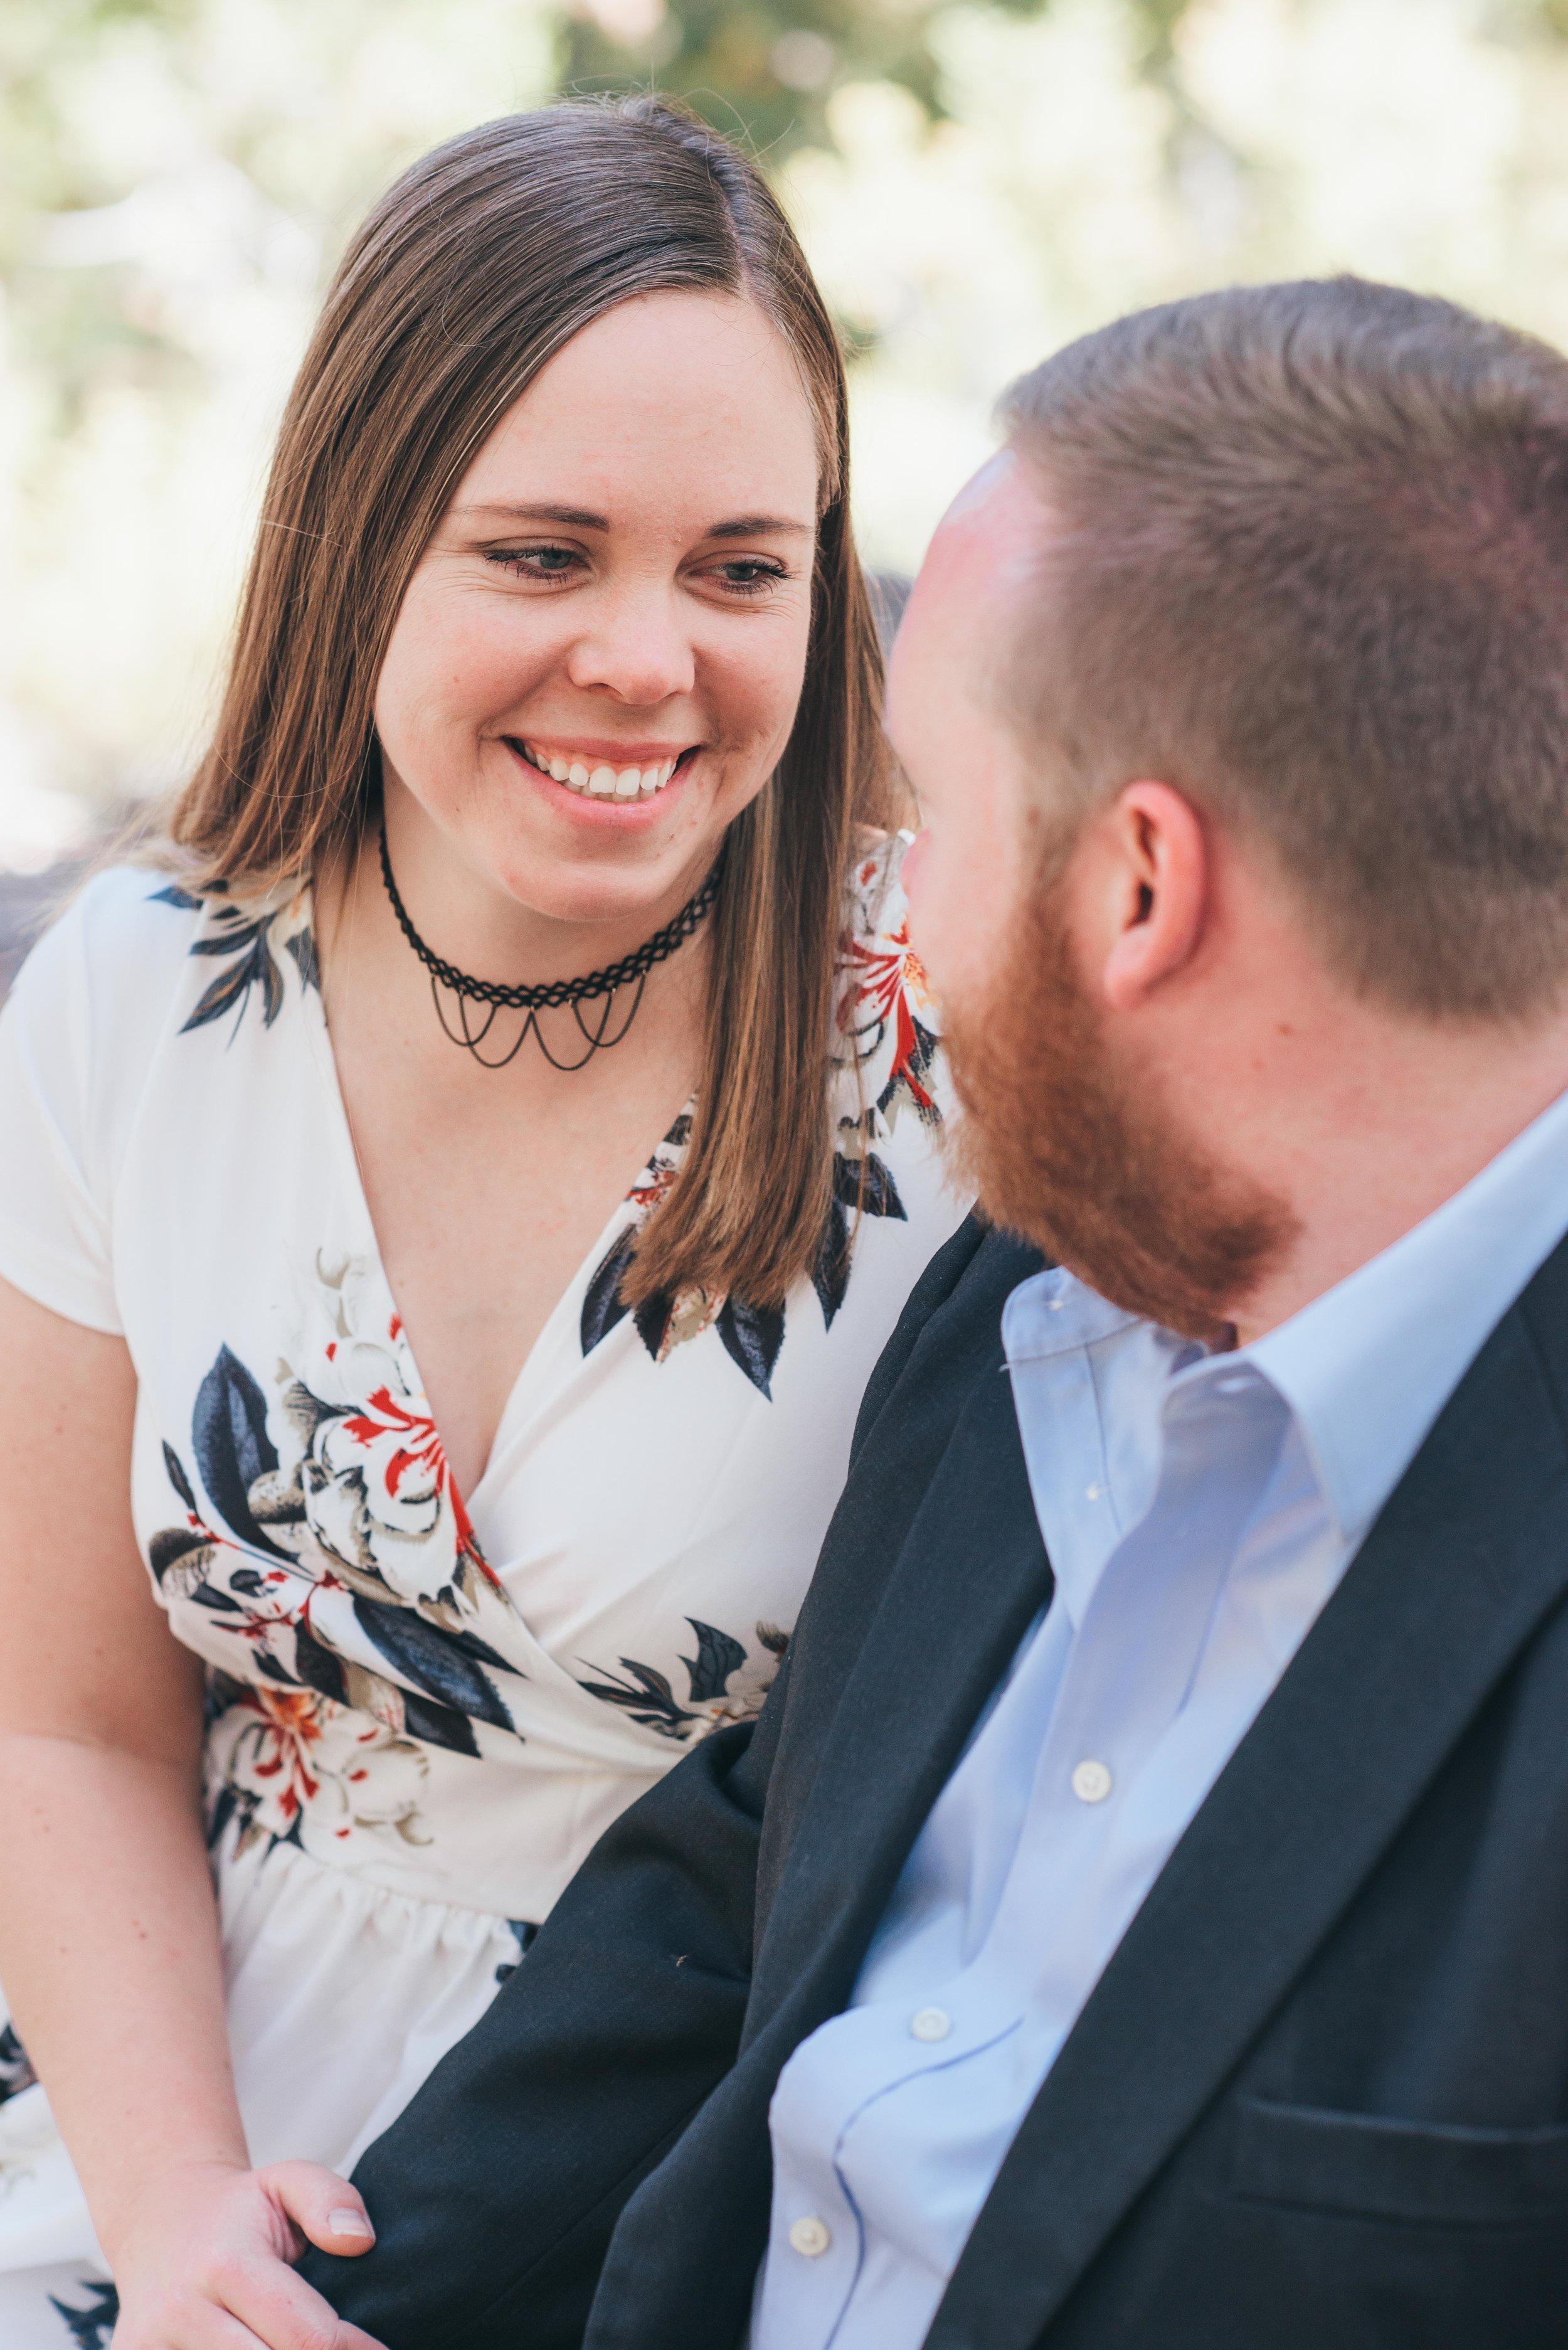 Oak Glen Wedding Photographer, Los Angeles Elopement Photographer, Engagement Photographer, Los Angeles Wedding Photographer, Palm Springs Wedding Photographer, Joshua Tree Wedding Photographer